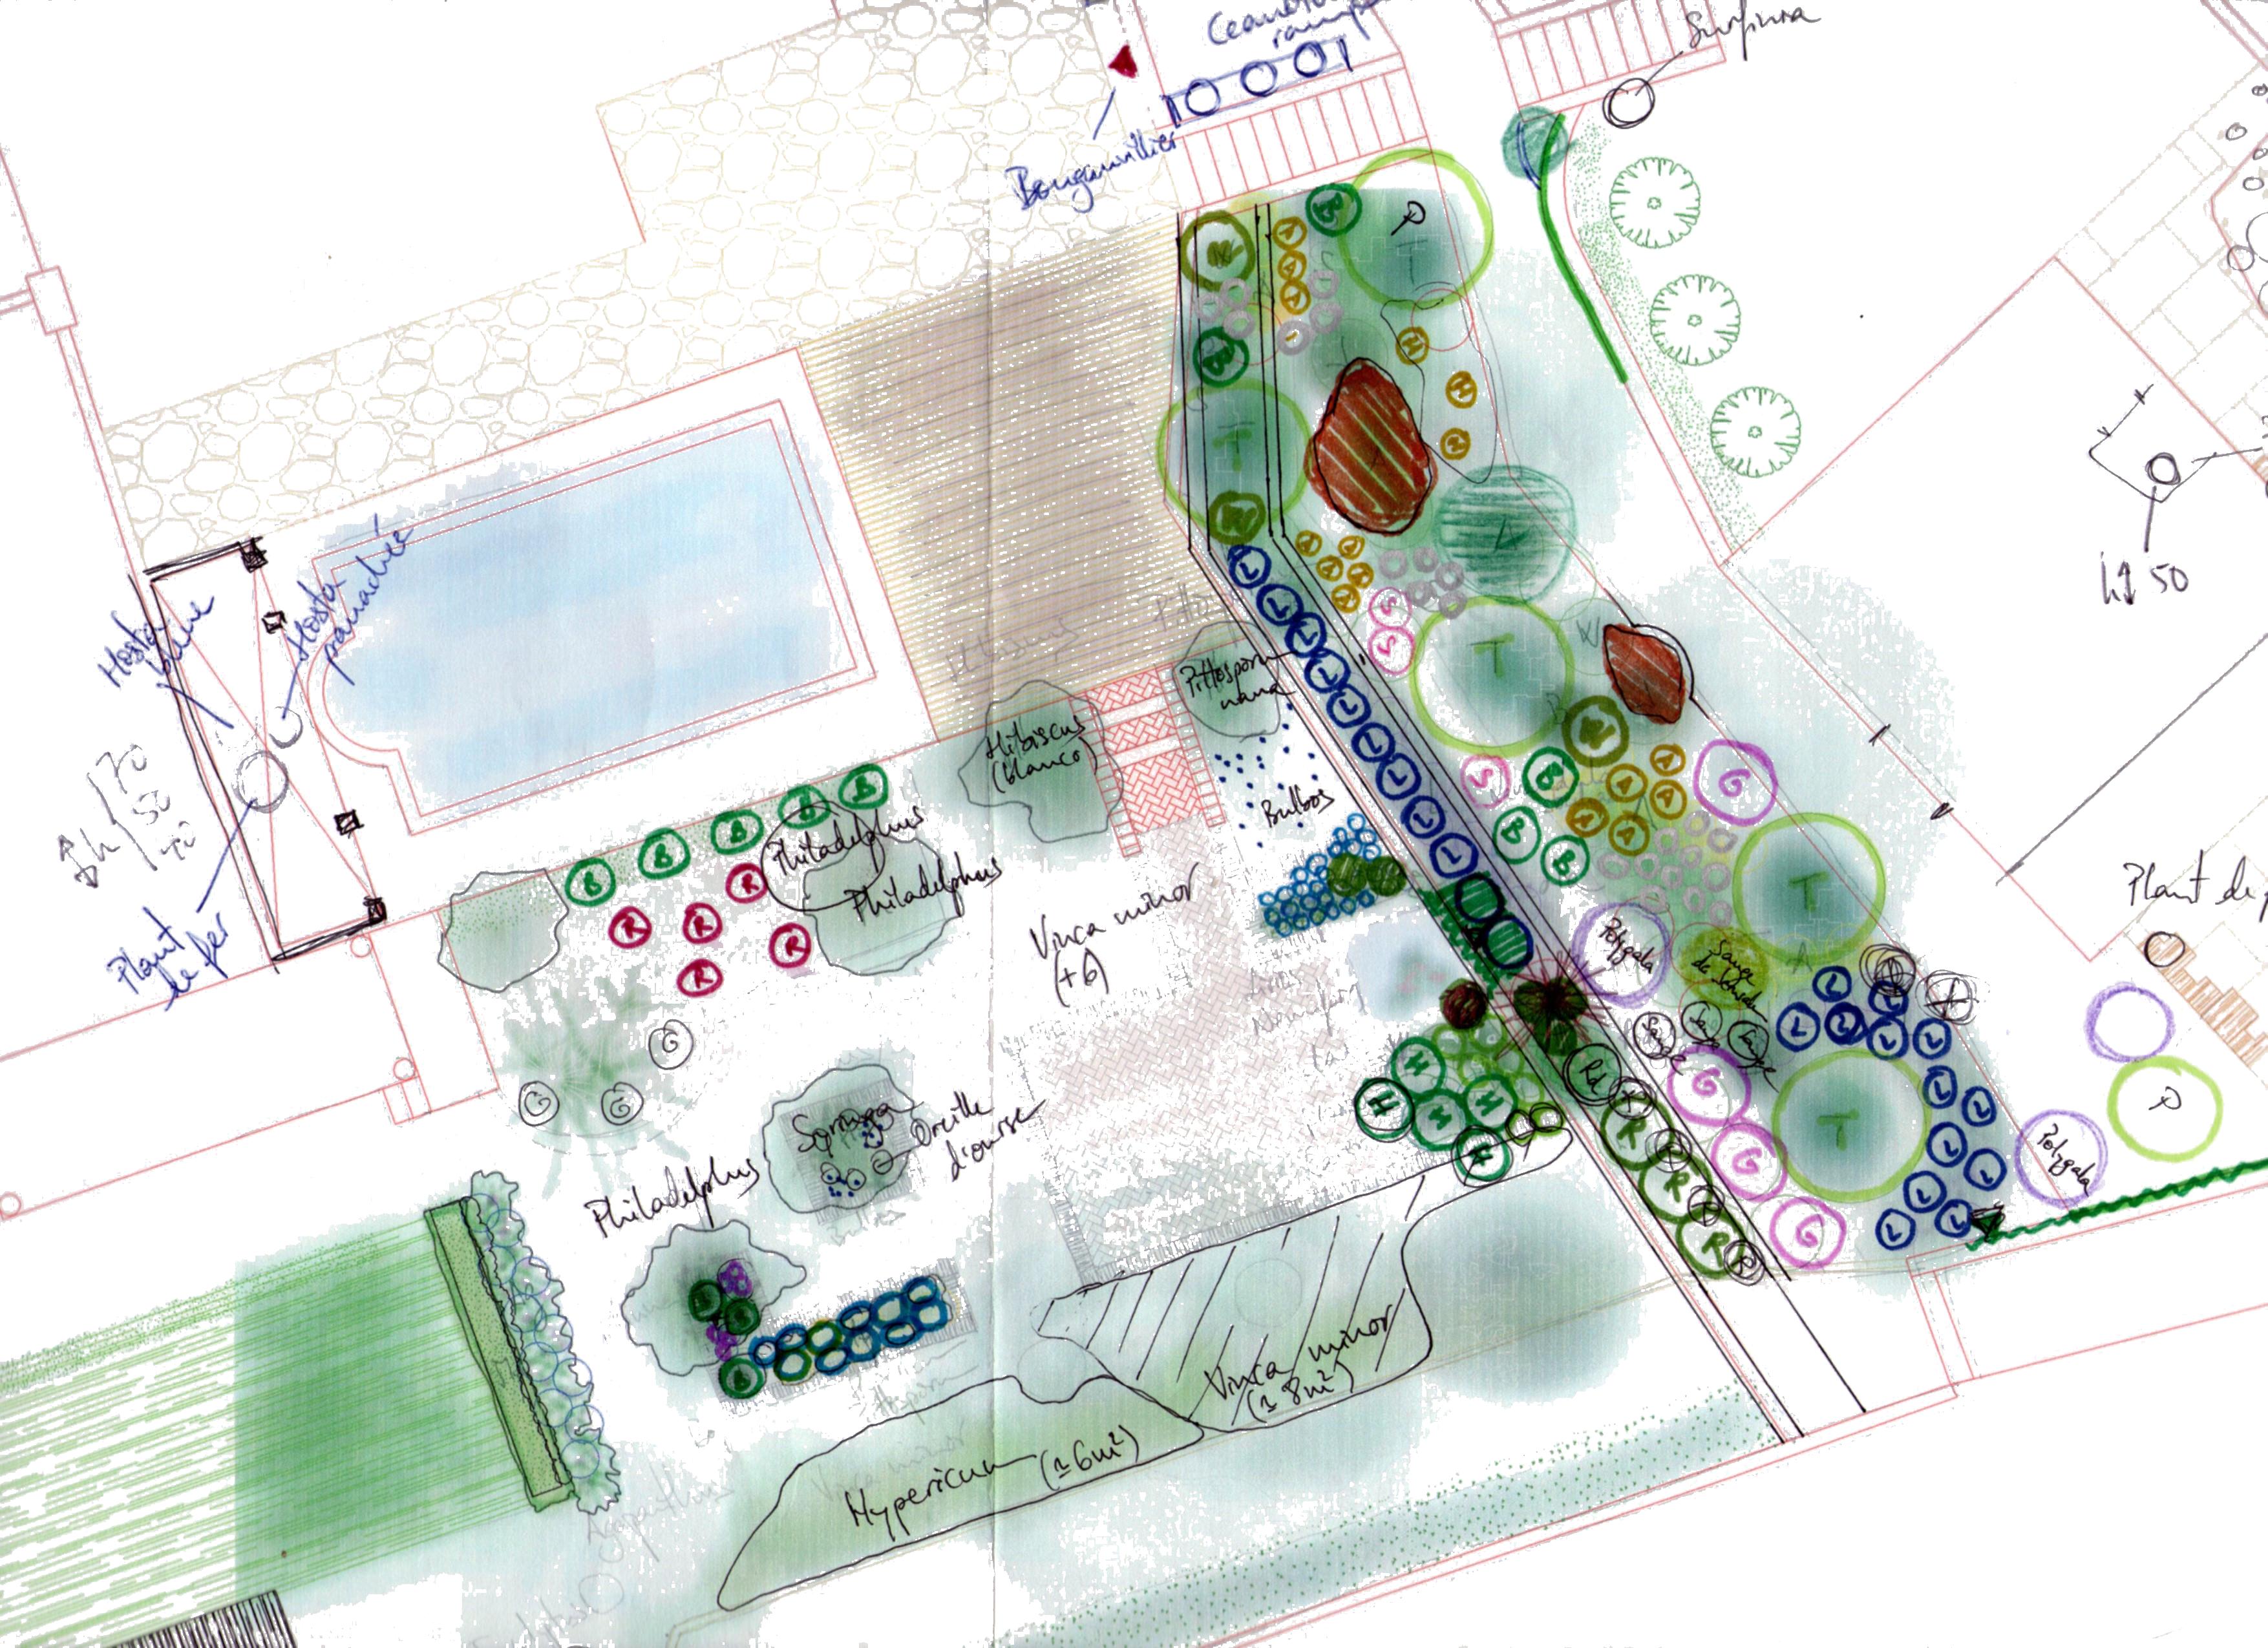 plano plx001